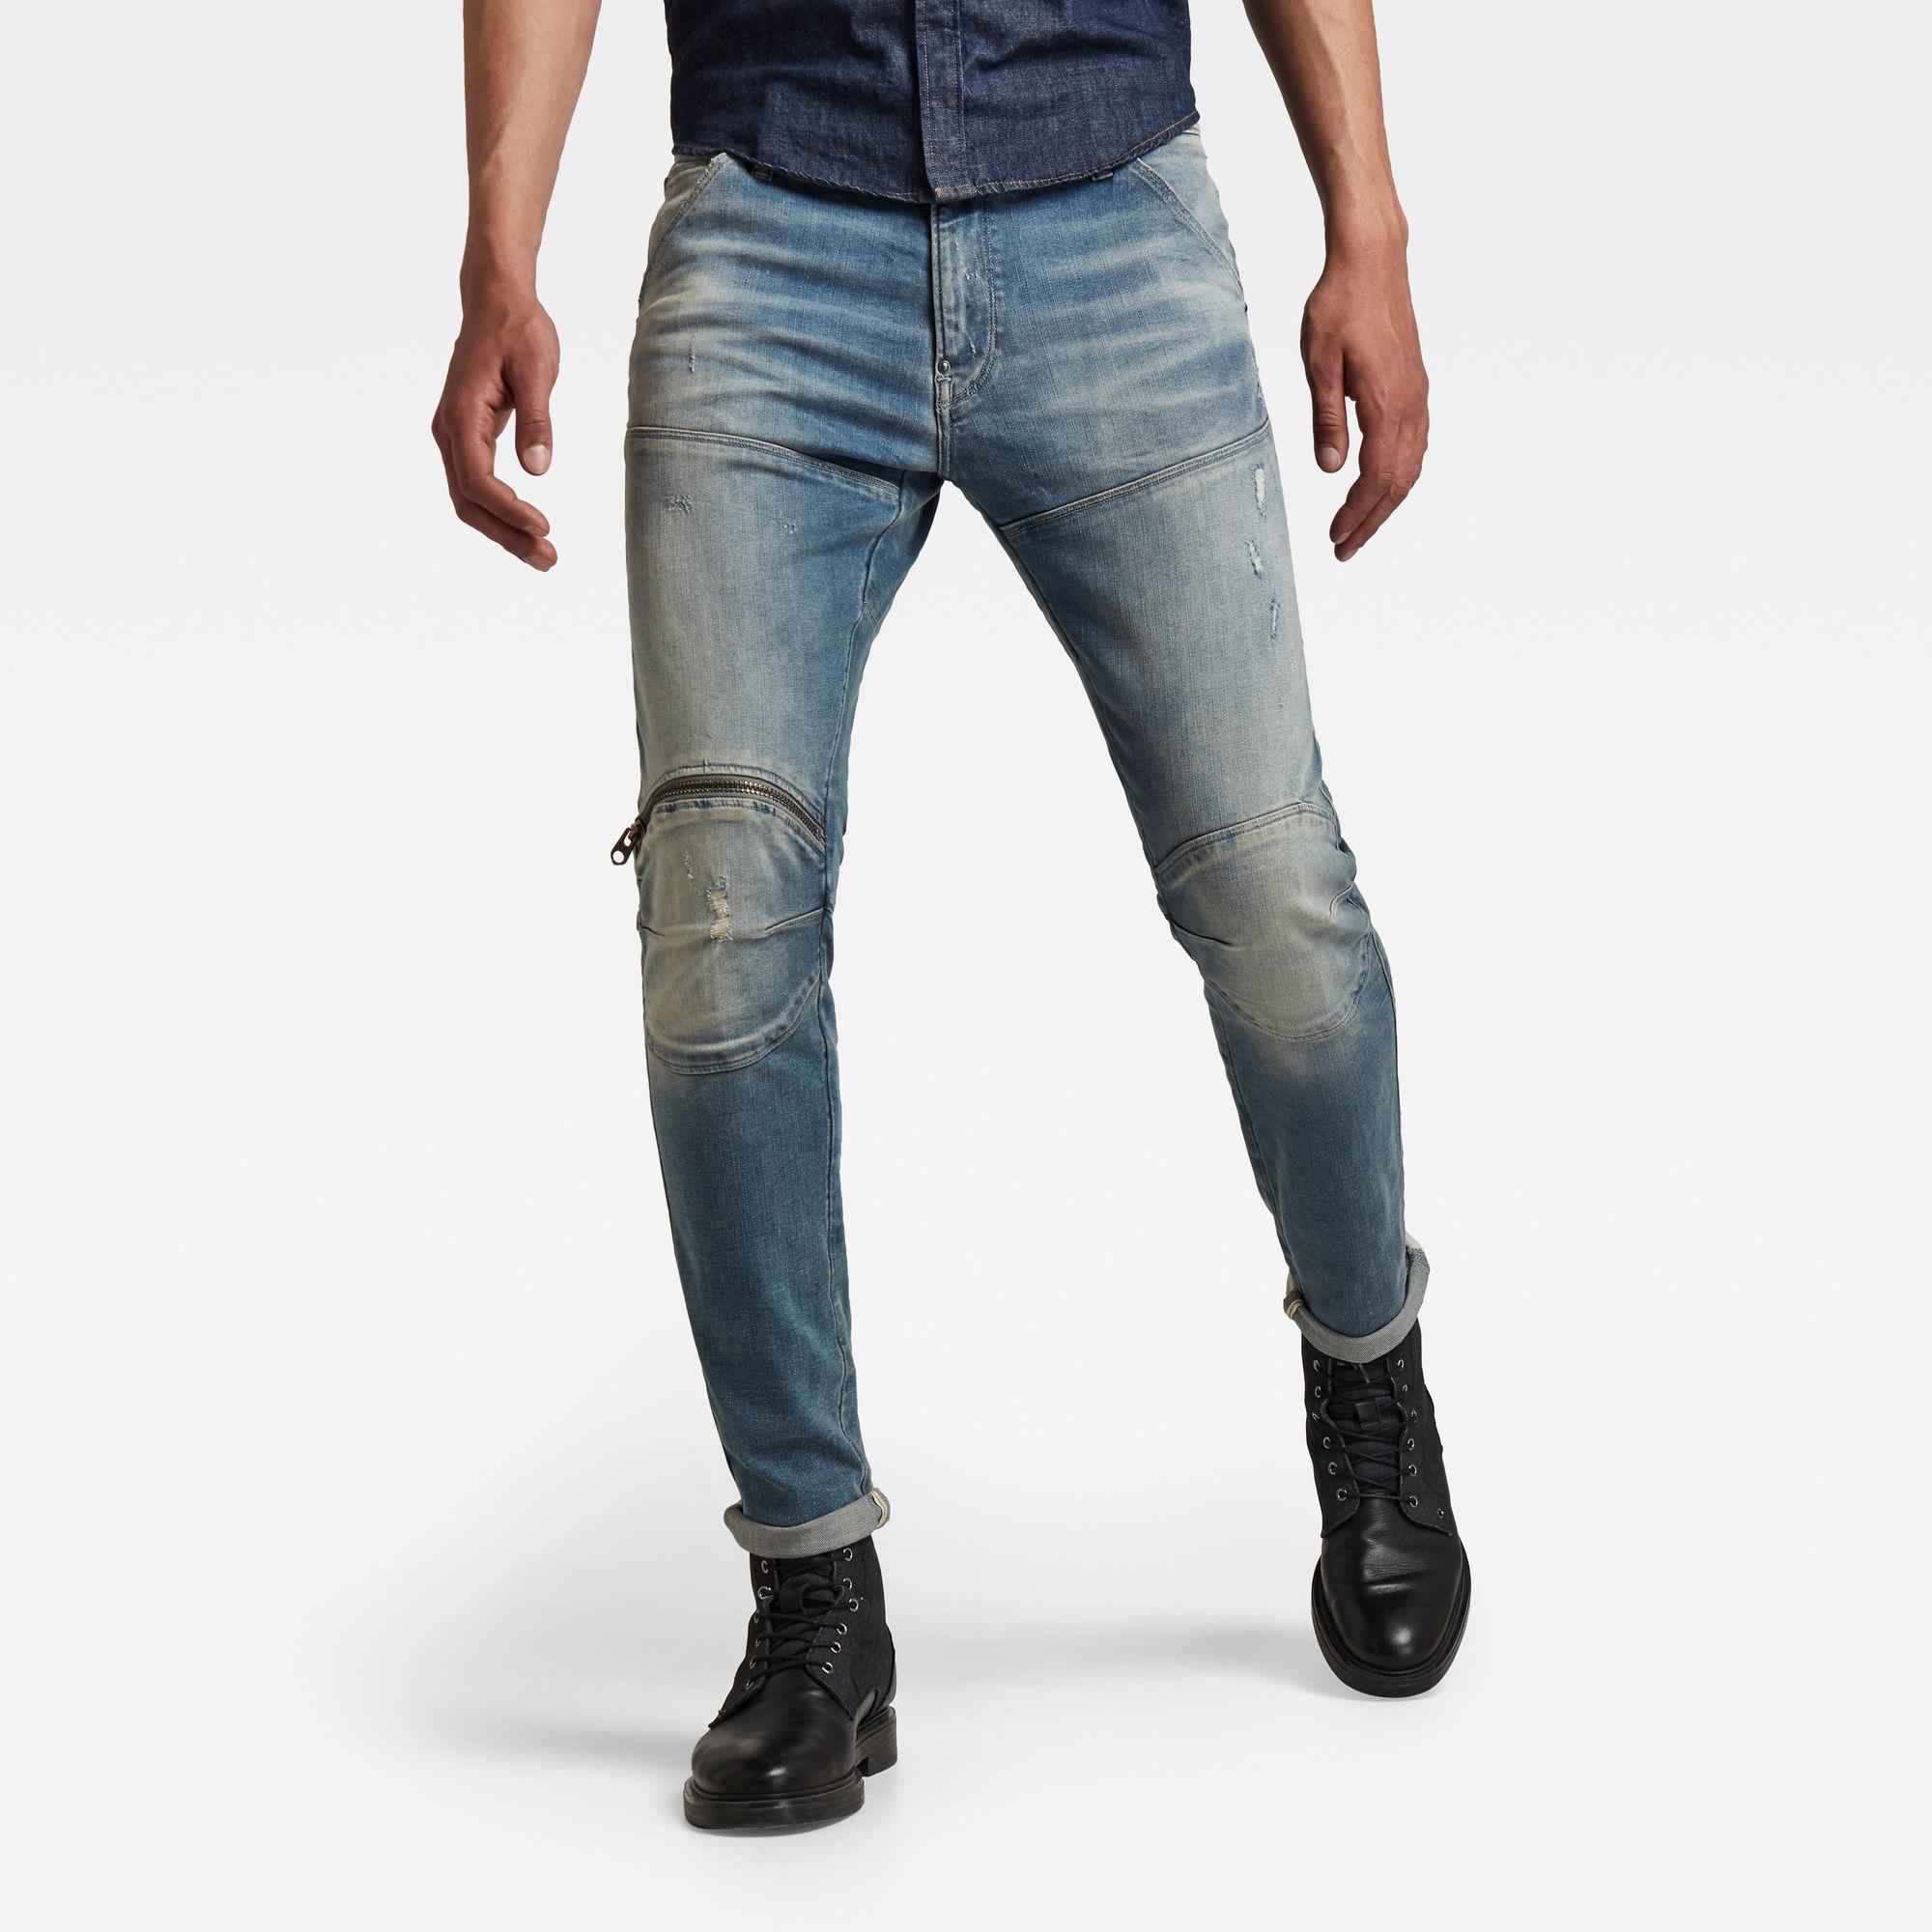 G-Star RAW Heren 5620 3D Zip Knee Skinny Jeans Blauw